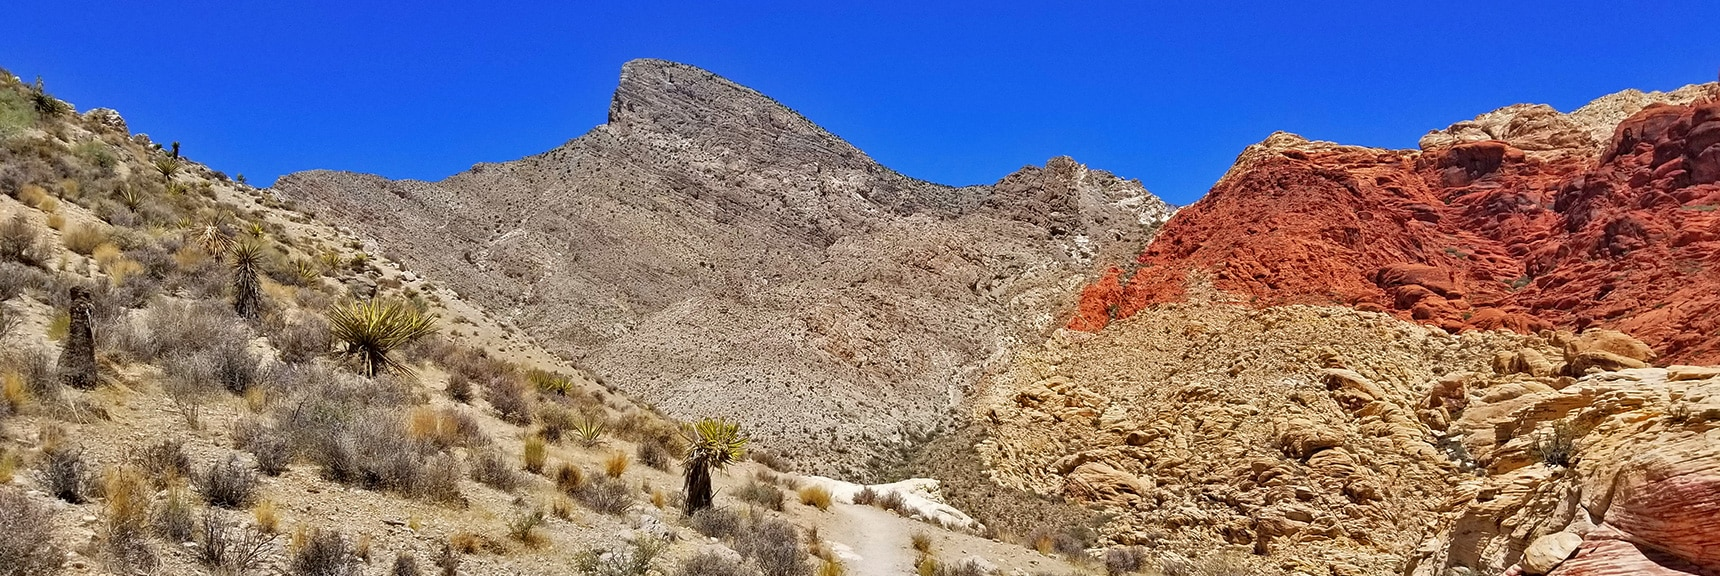 Looking Down the Kraft Mountain Loop Toward Turtlehead Peak | Kraft Mountain Loop | Calico Basin, Nevada